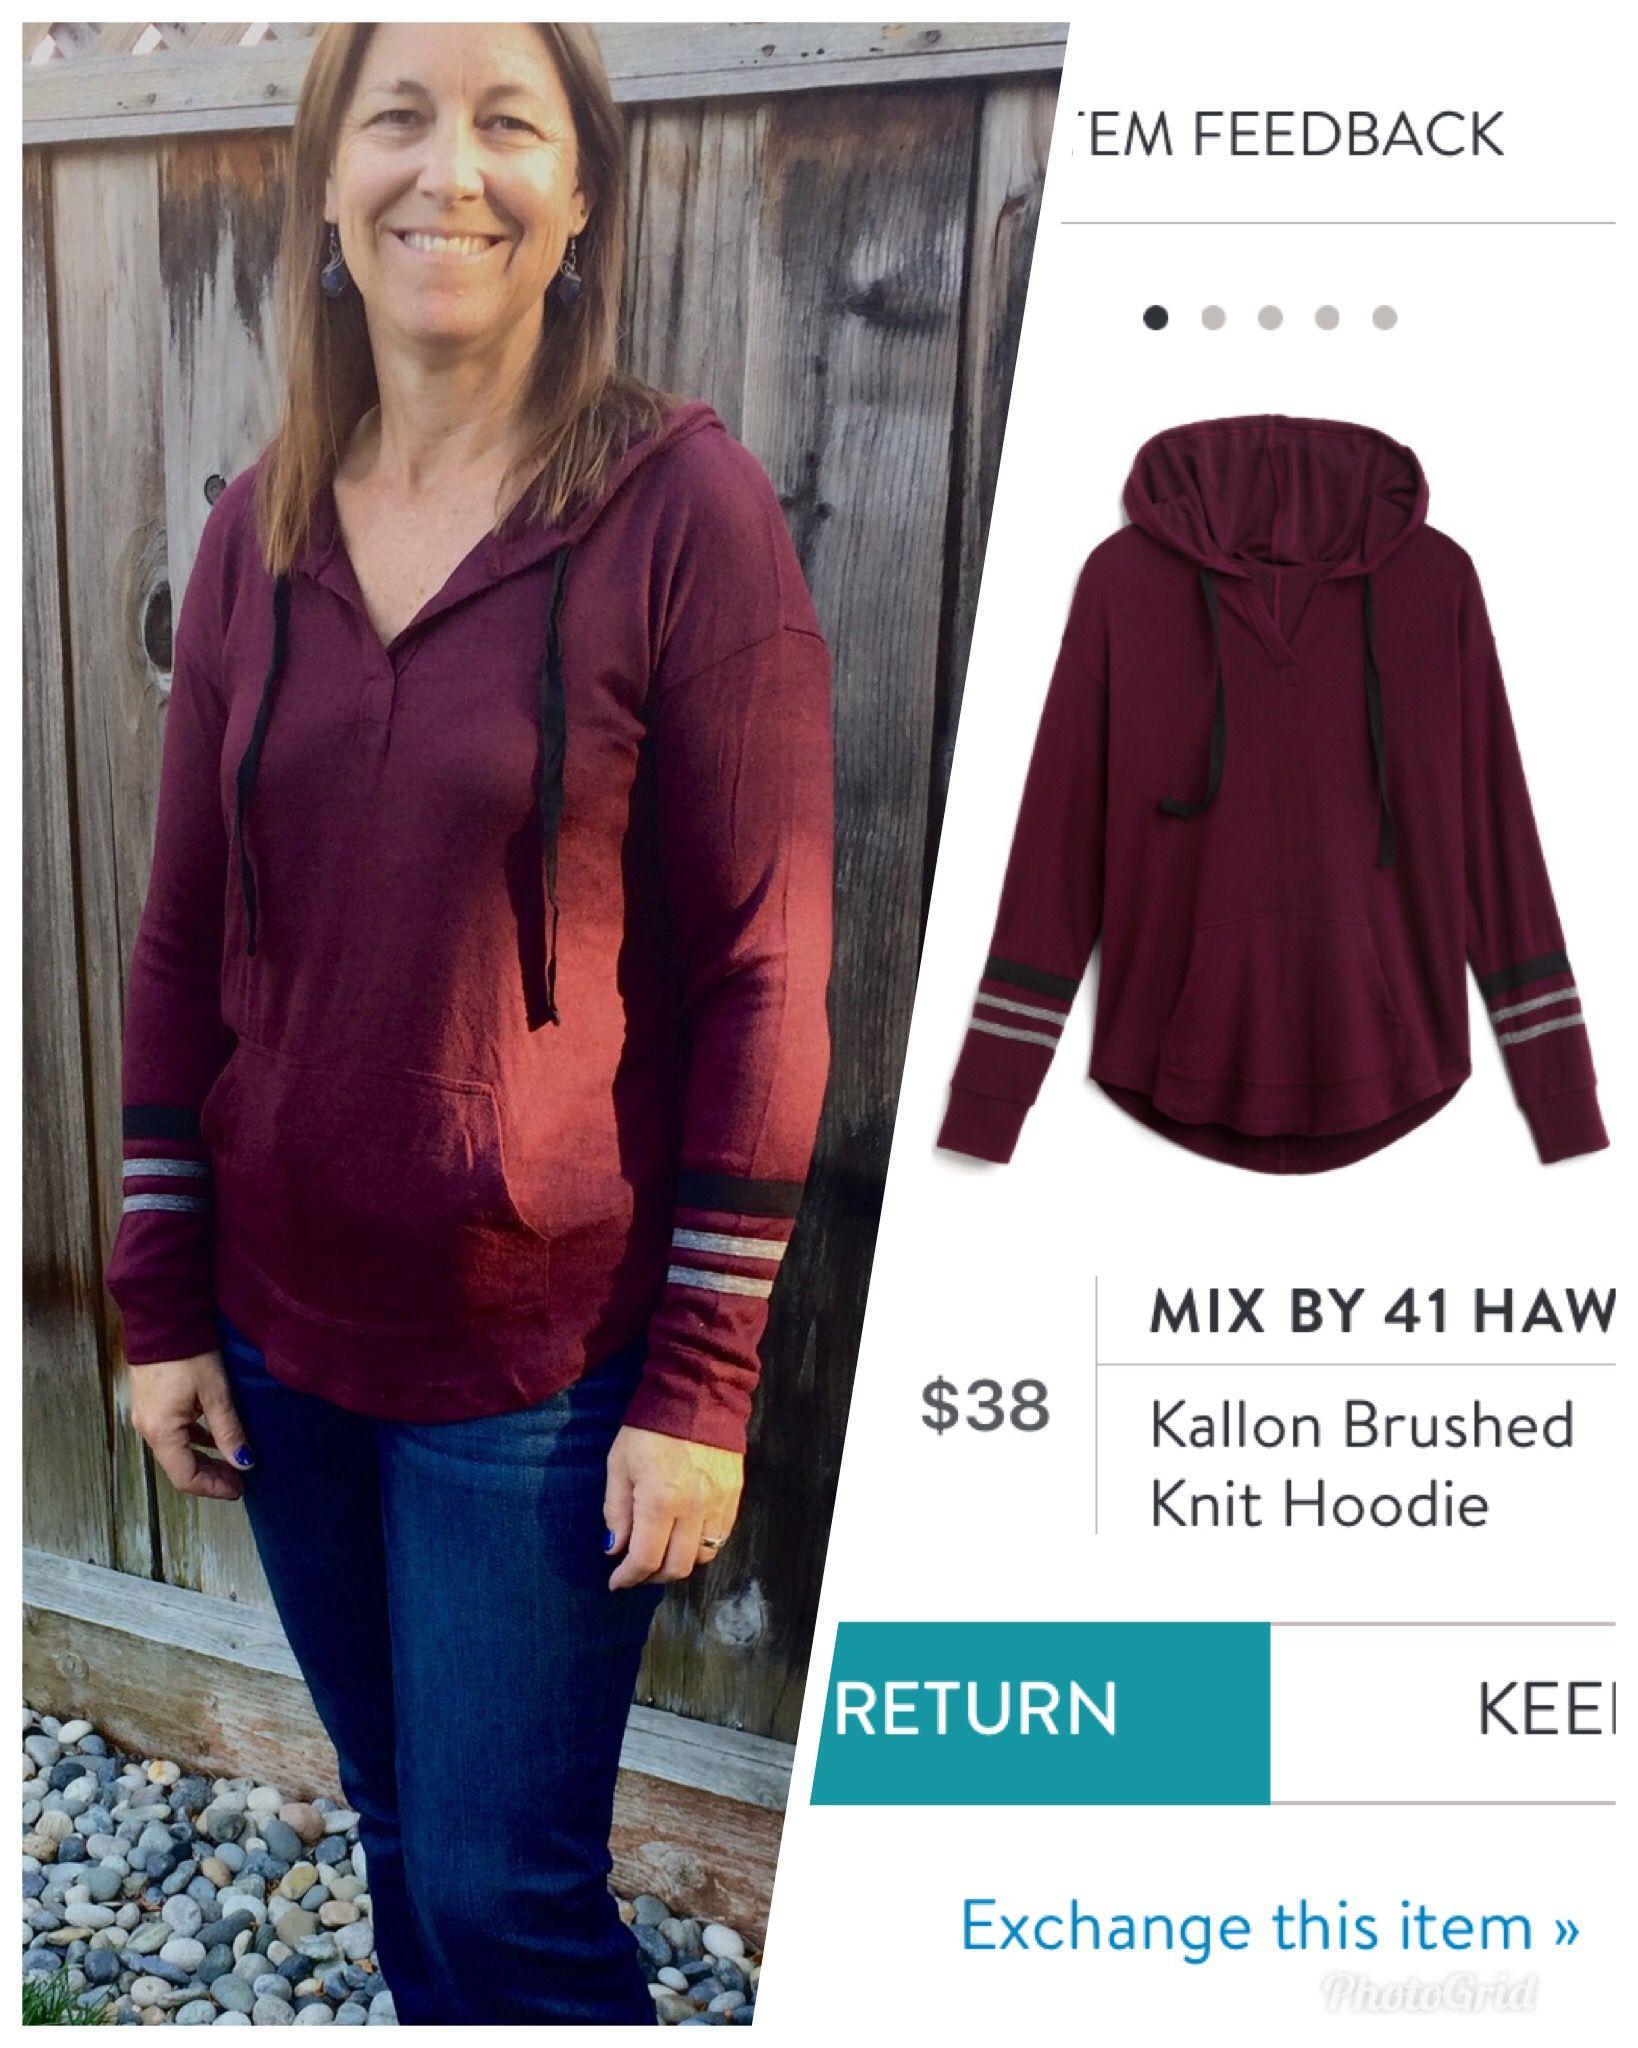 Fix #8 (Oct 2018) Mix by 41 Hawthorne Kallon Brushed Knit